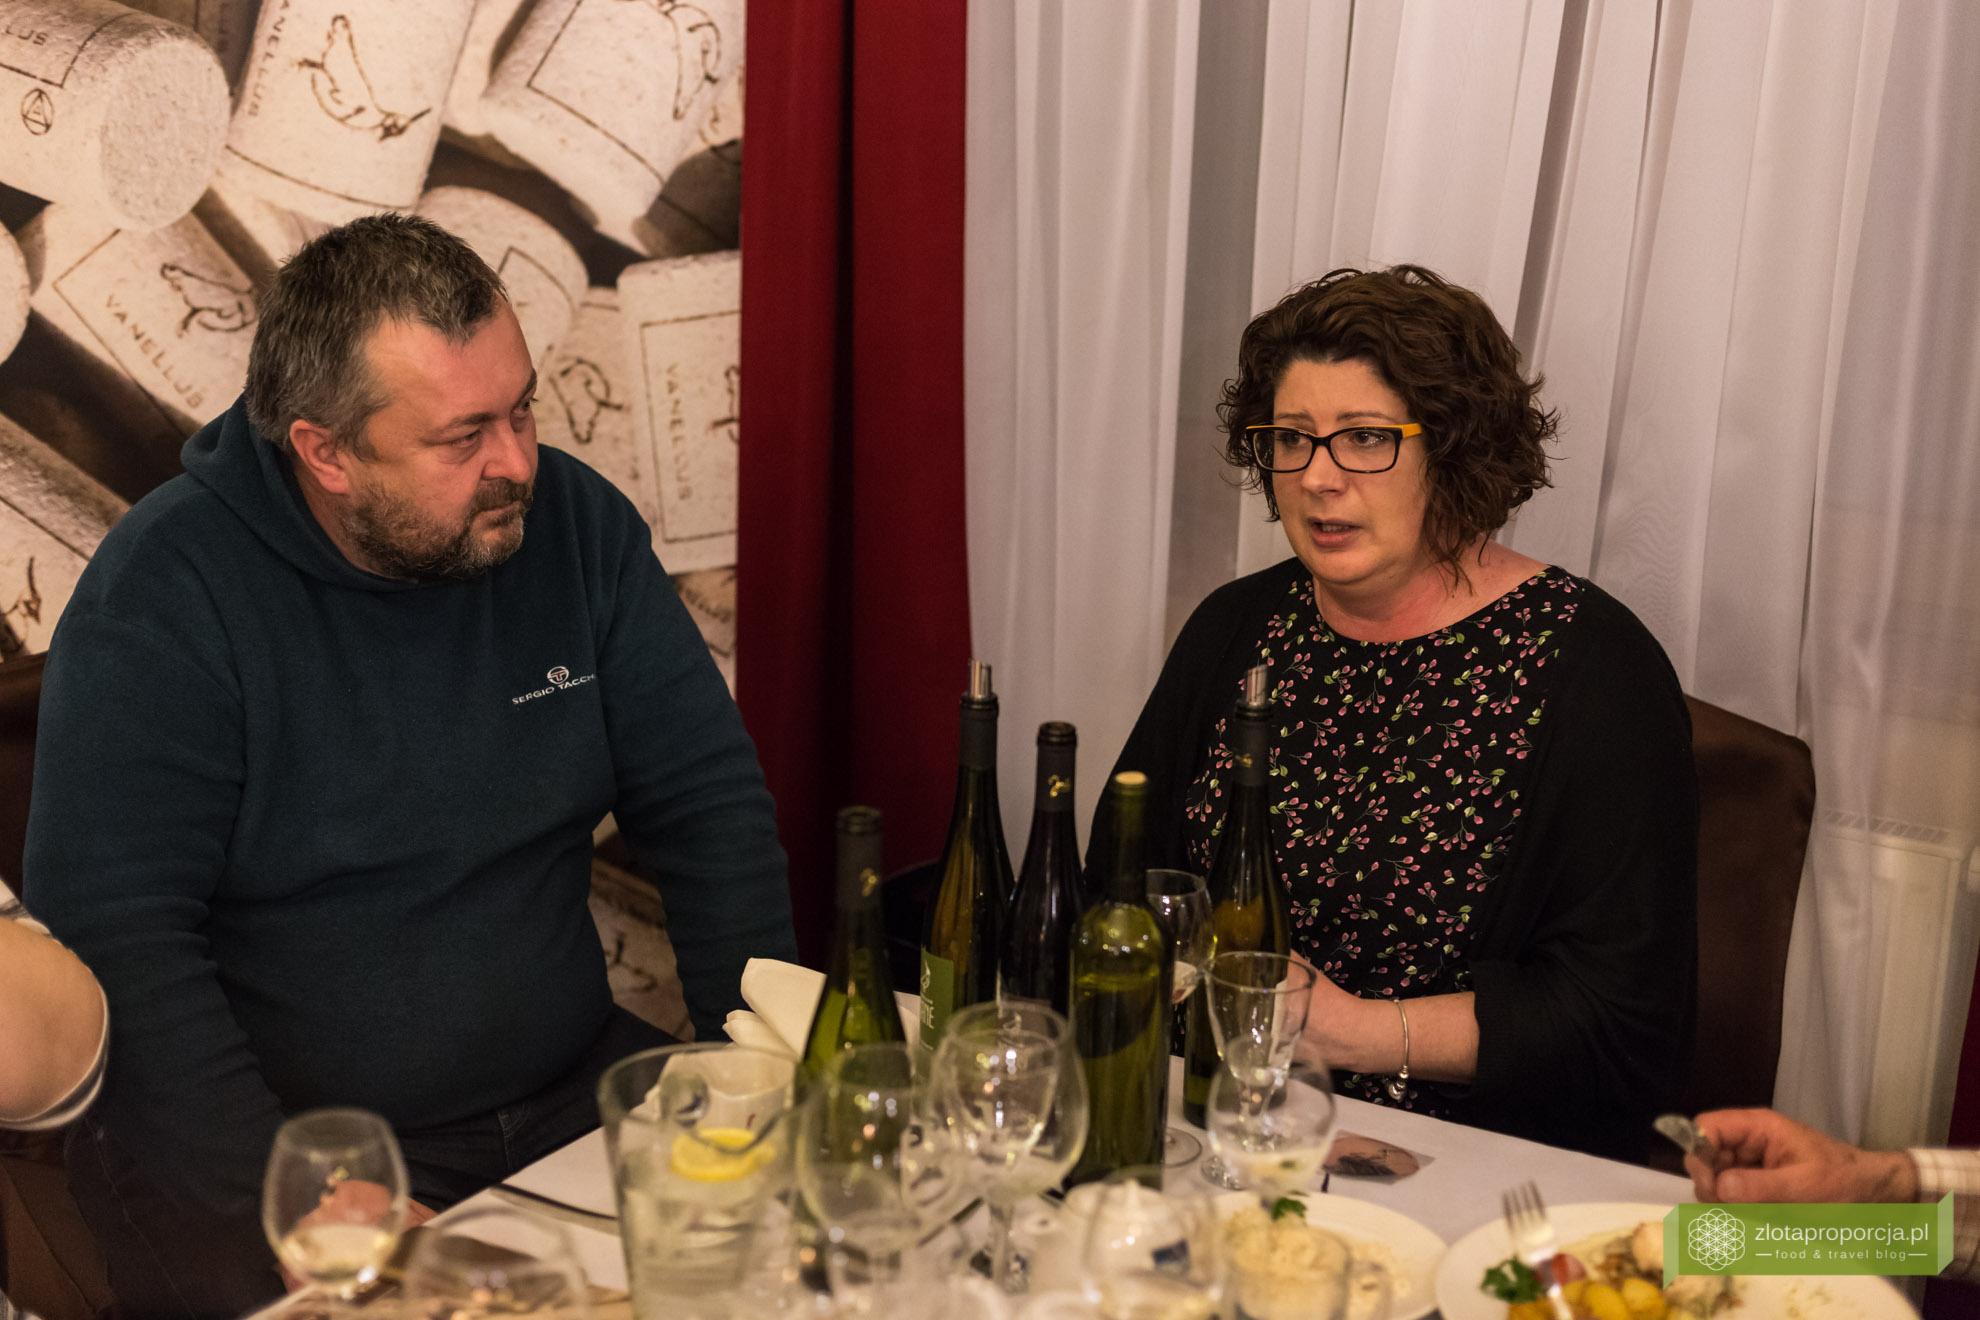 Winnica Vanellus, Karpacki Szlak Wina, winnice na Podkarpaciu, winnice Podkarpacia,